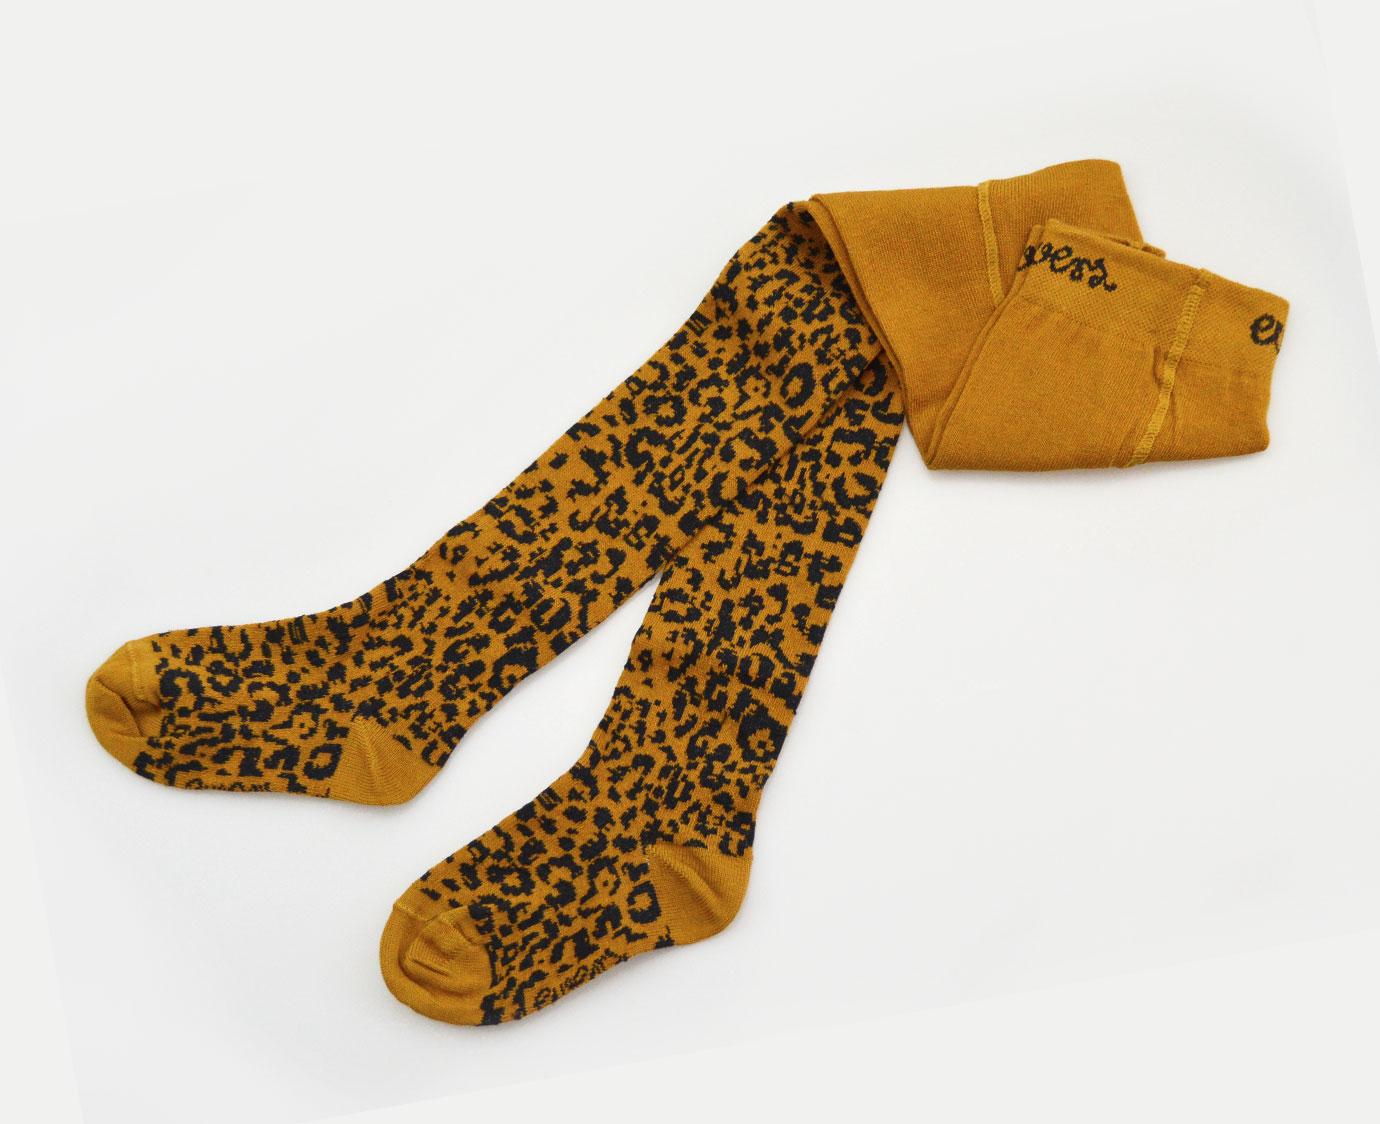 Maillot 'Leopard' mosterd